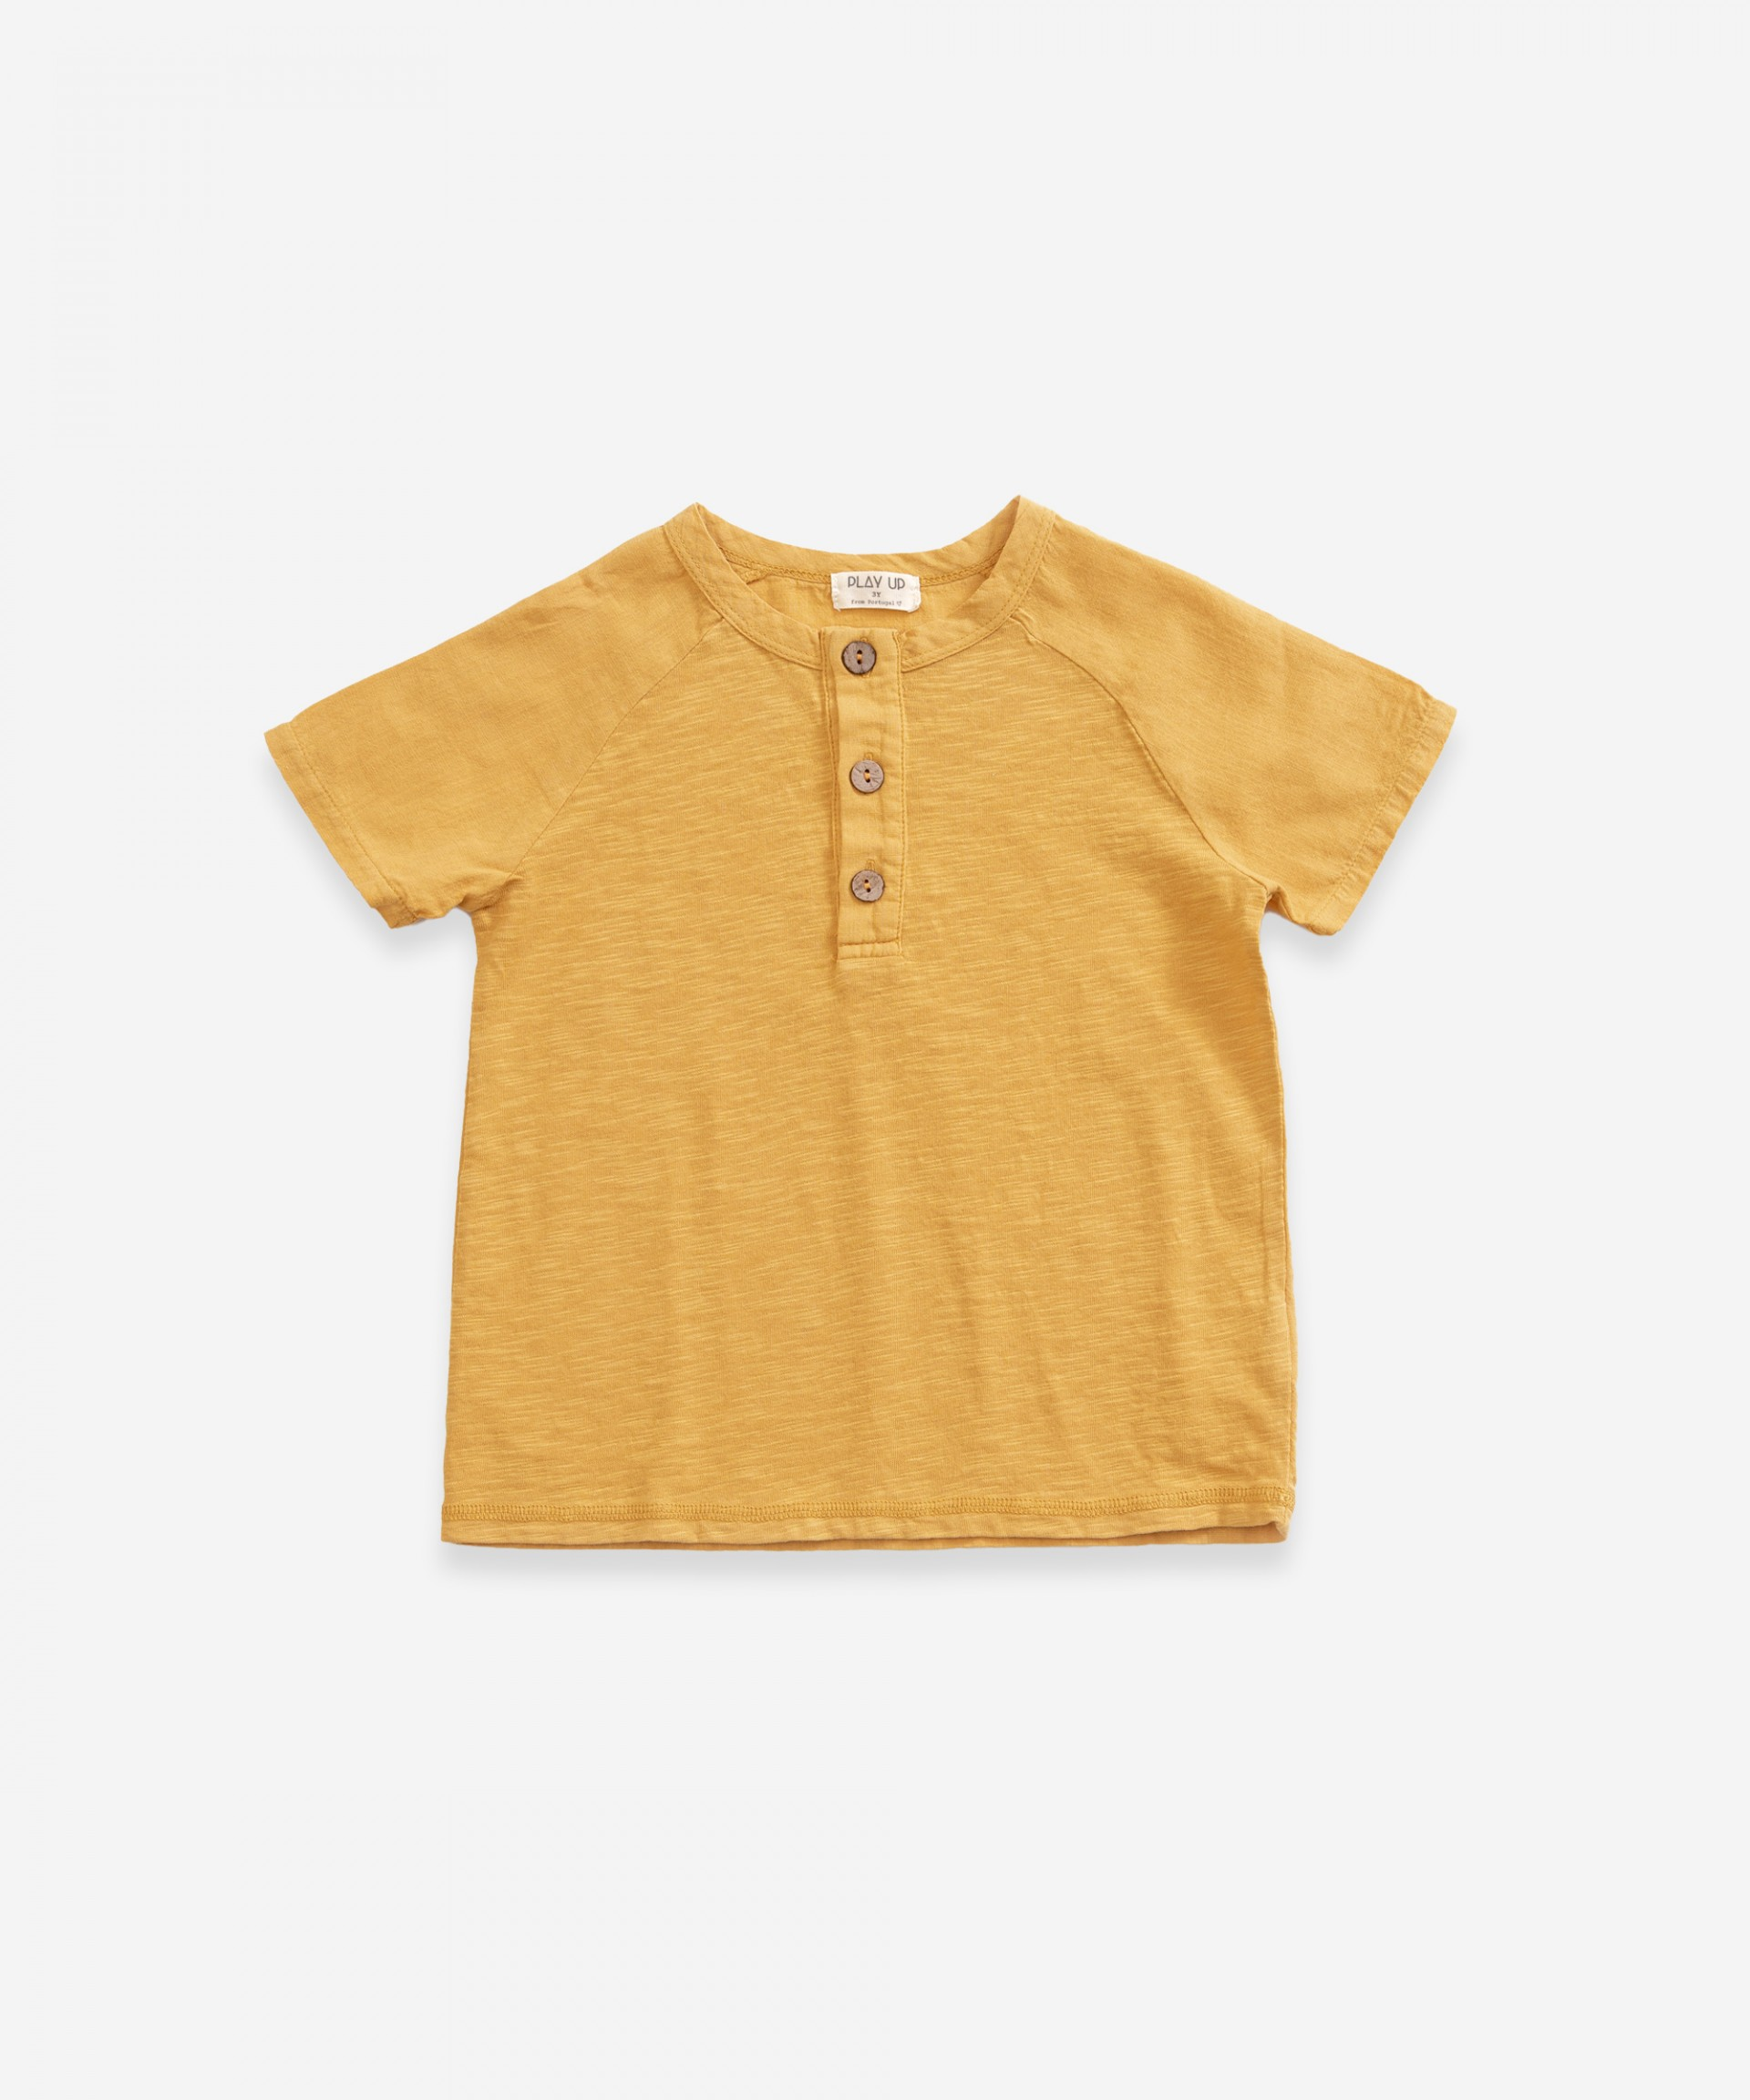 T-shirt in mixed cotton | Weaving